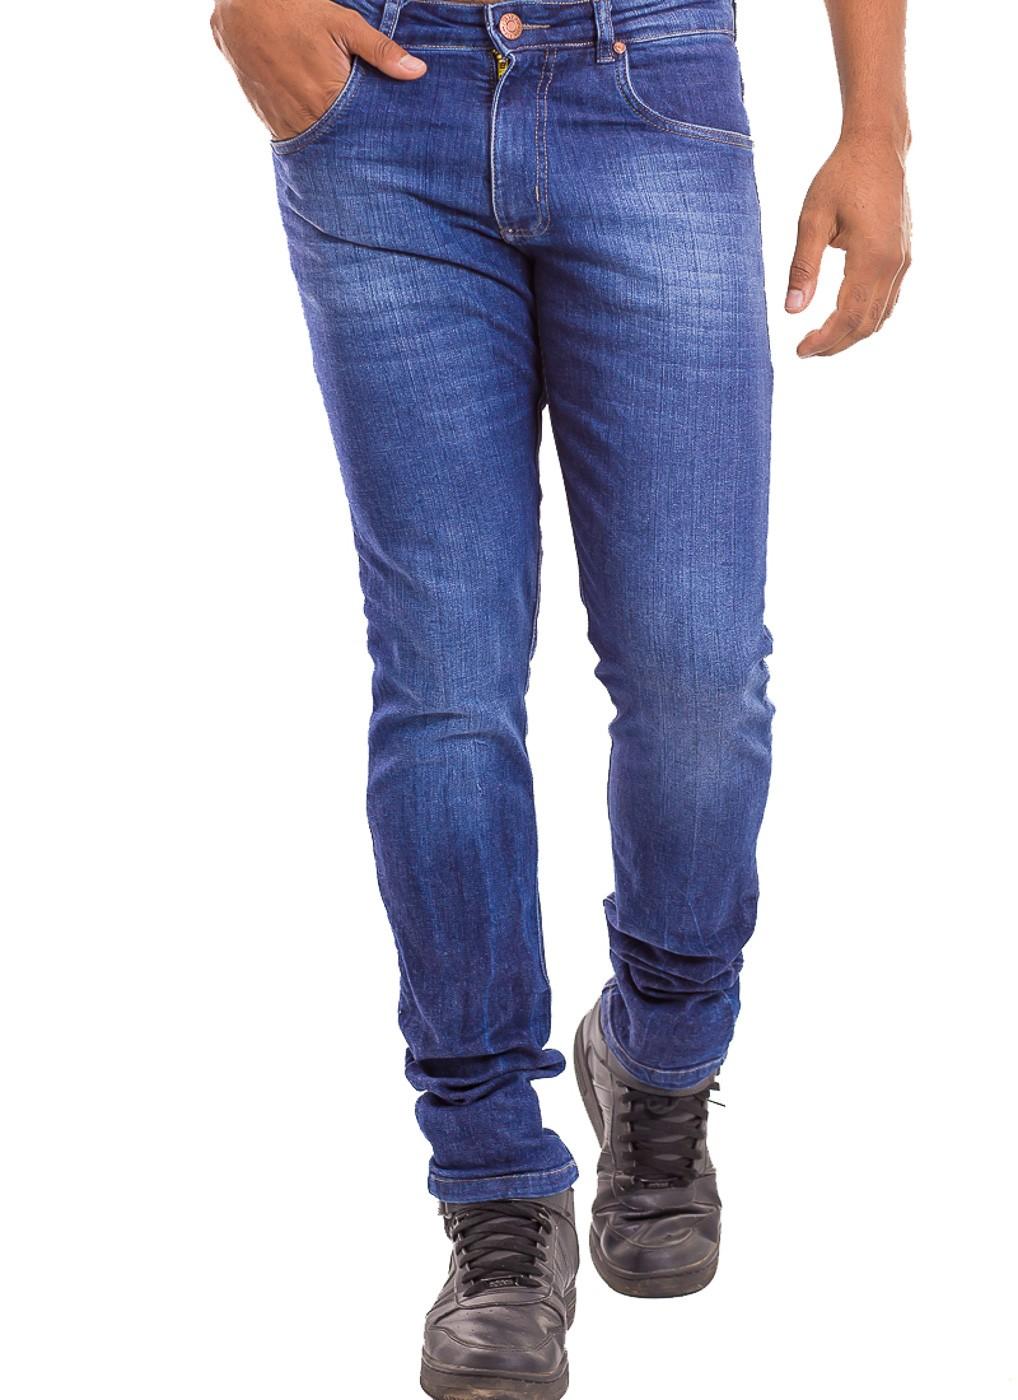 Calça Calvin Klein Jeans Masculina Skinny CKJ 016 Azul Escuro Stonada